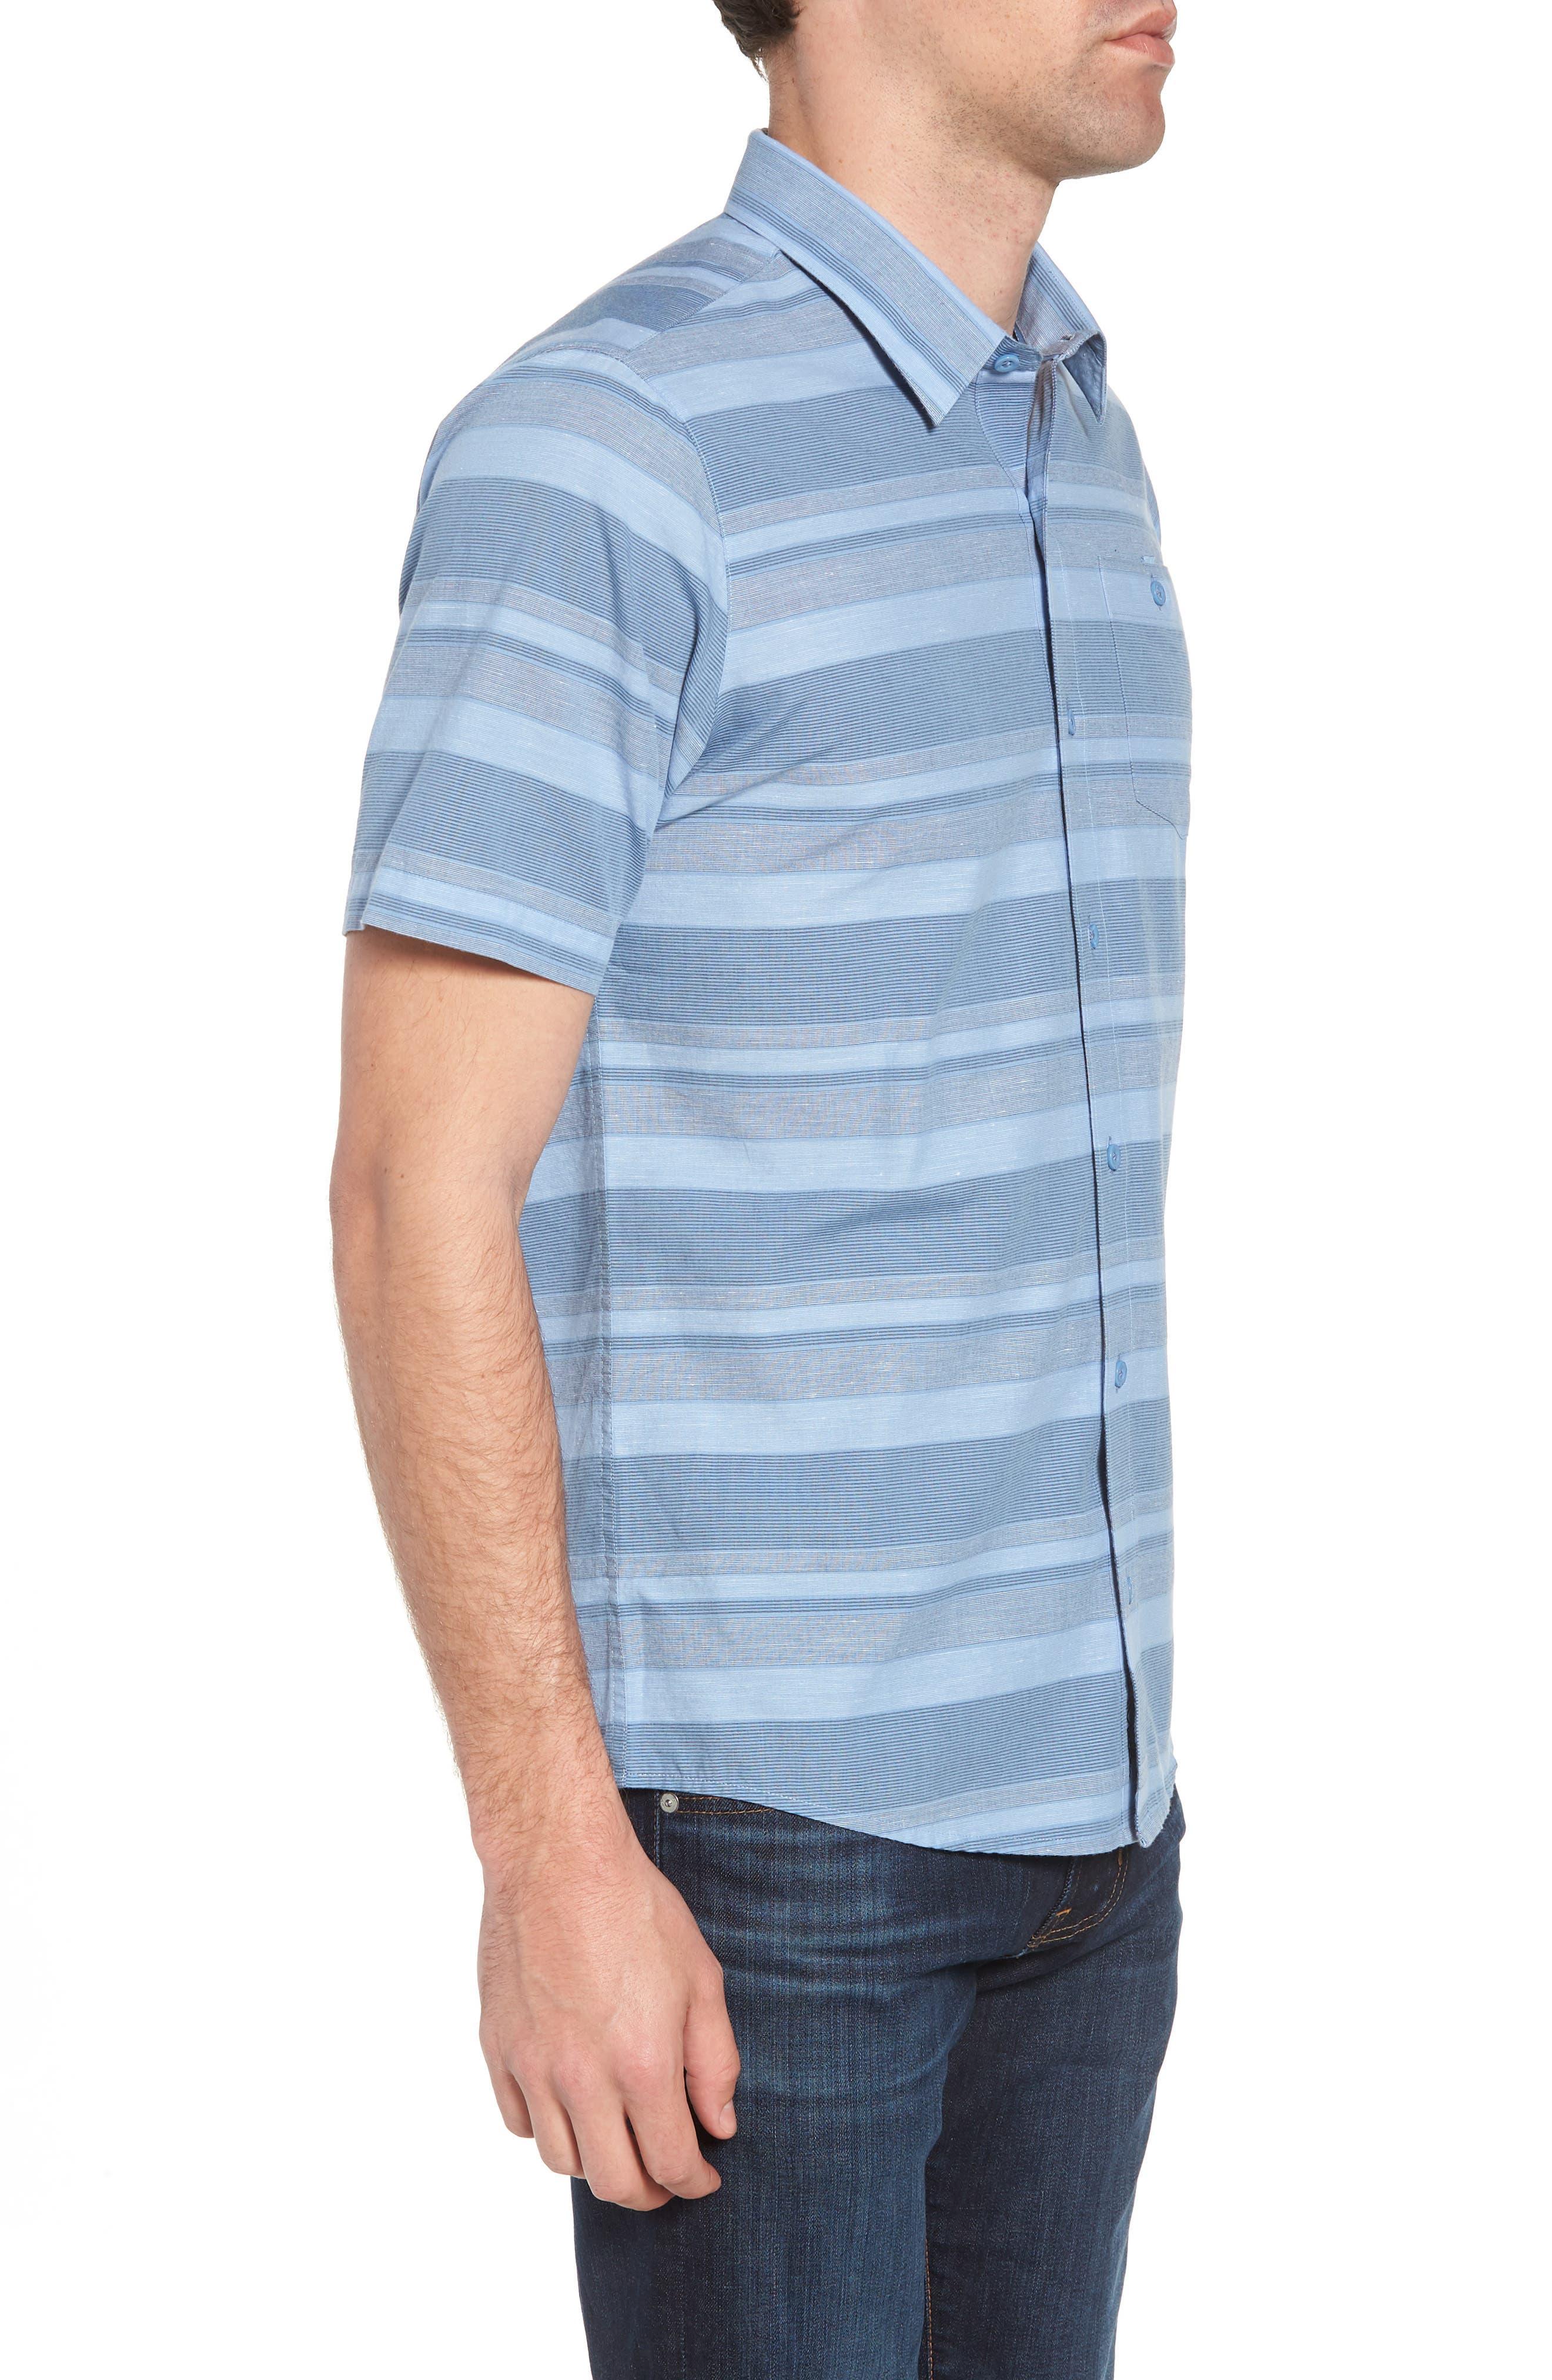 Mahe Regular Fit Sport Shirt,                             Alternate thumbnail 4, color,                             Heather Blue Nights